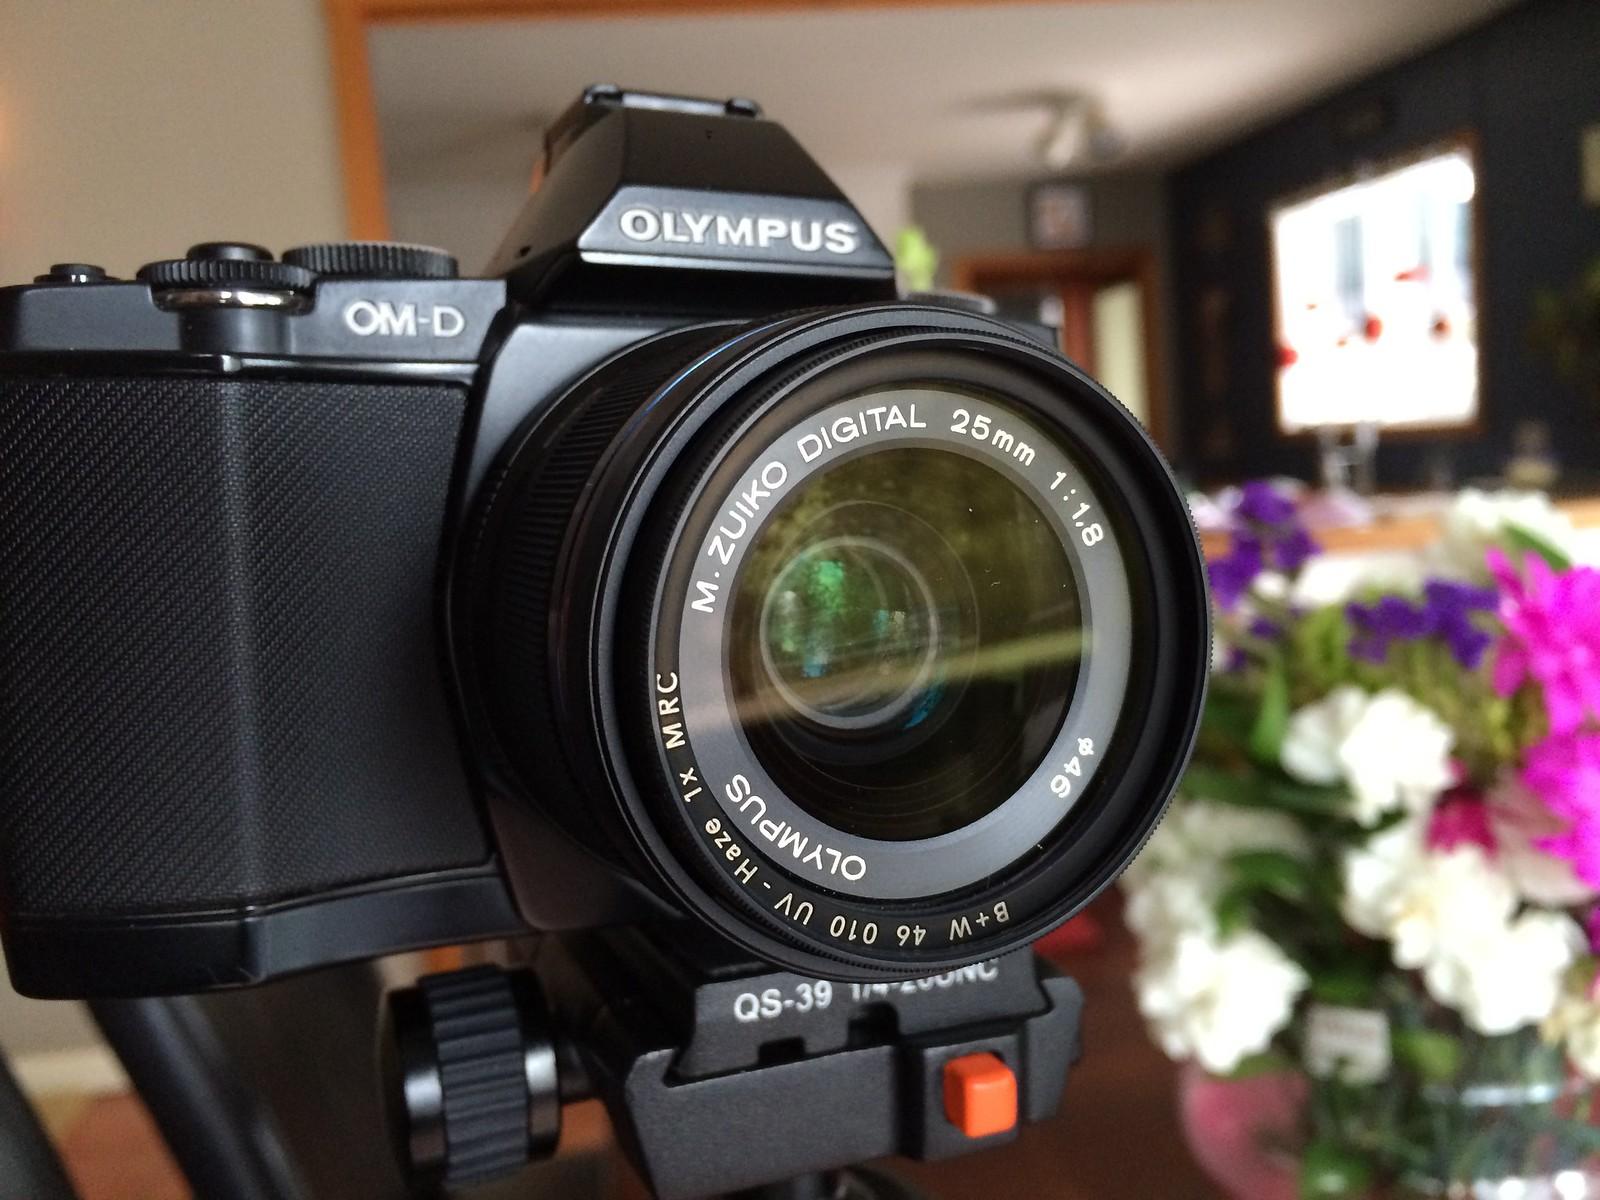 Olympus OM-D E-M5 with Olympus 25mm f1.8 Lens